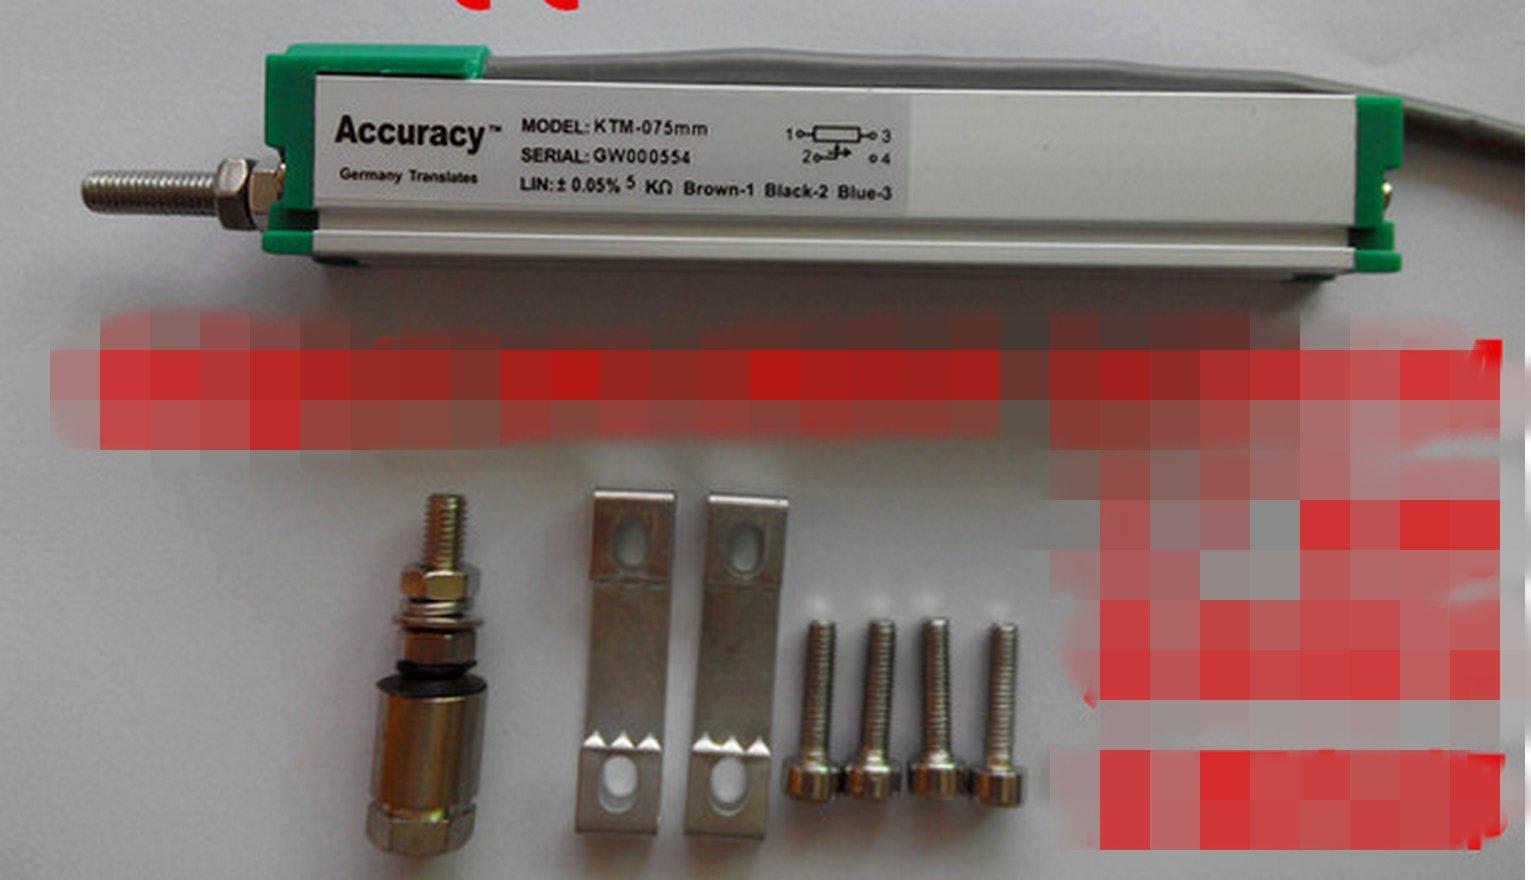 ACCURACY KTM micro rod type linear displacement sensor 225mm linear sensor KTM-225MM by JIAWANSHUN (Image #2)